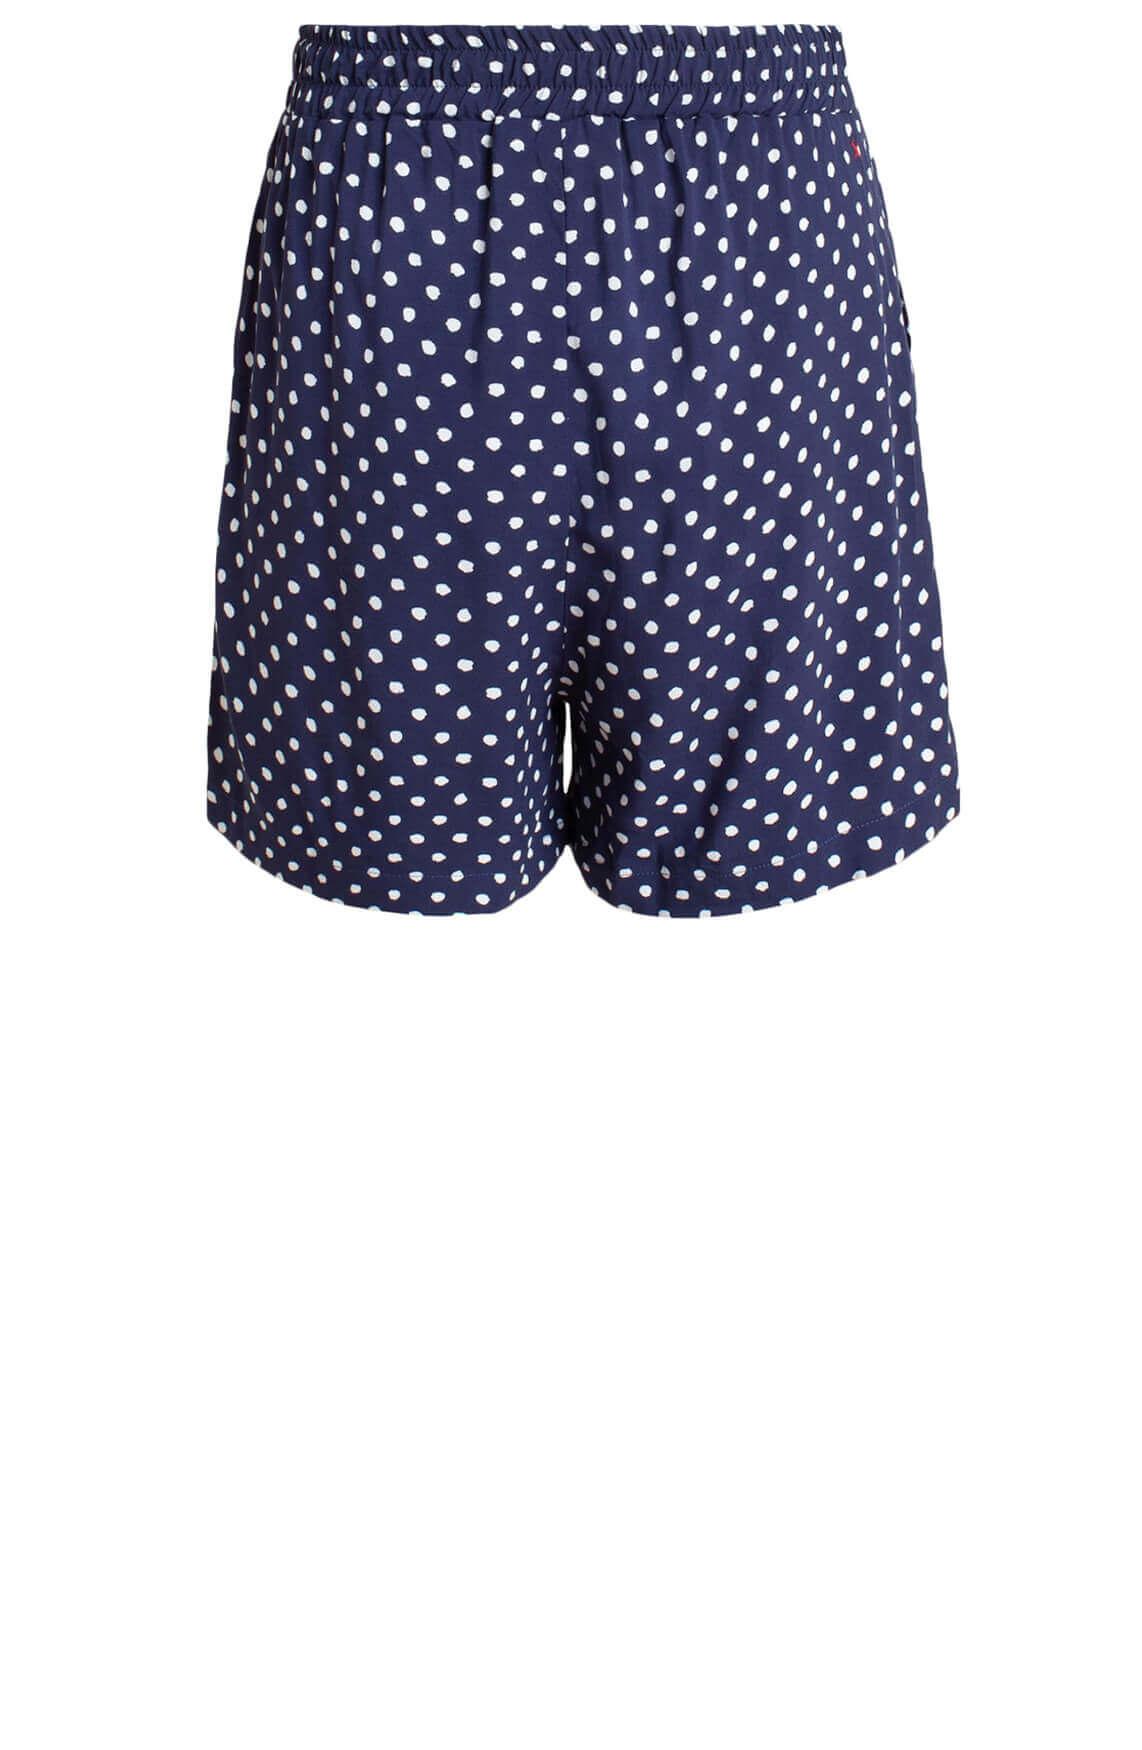 Anna Blue Dames Short met stippen Blauw